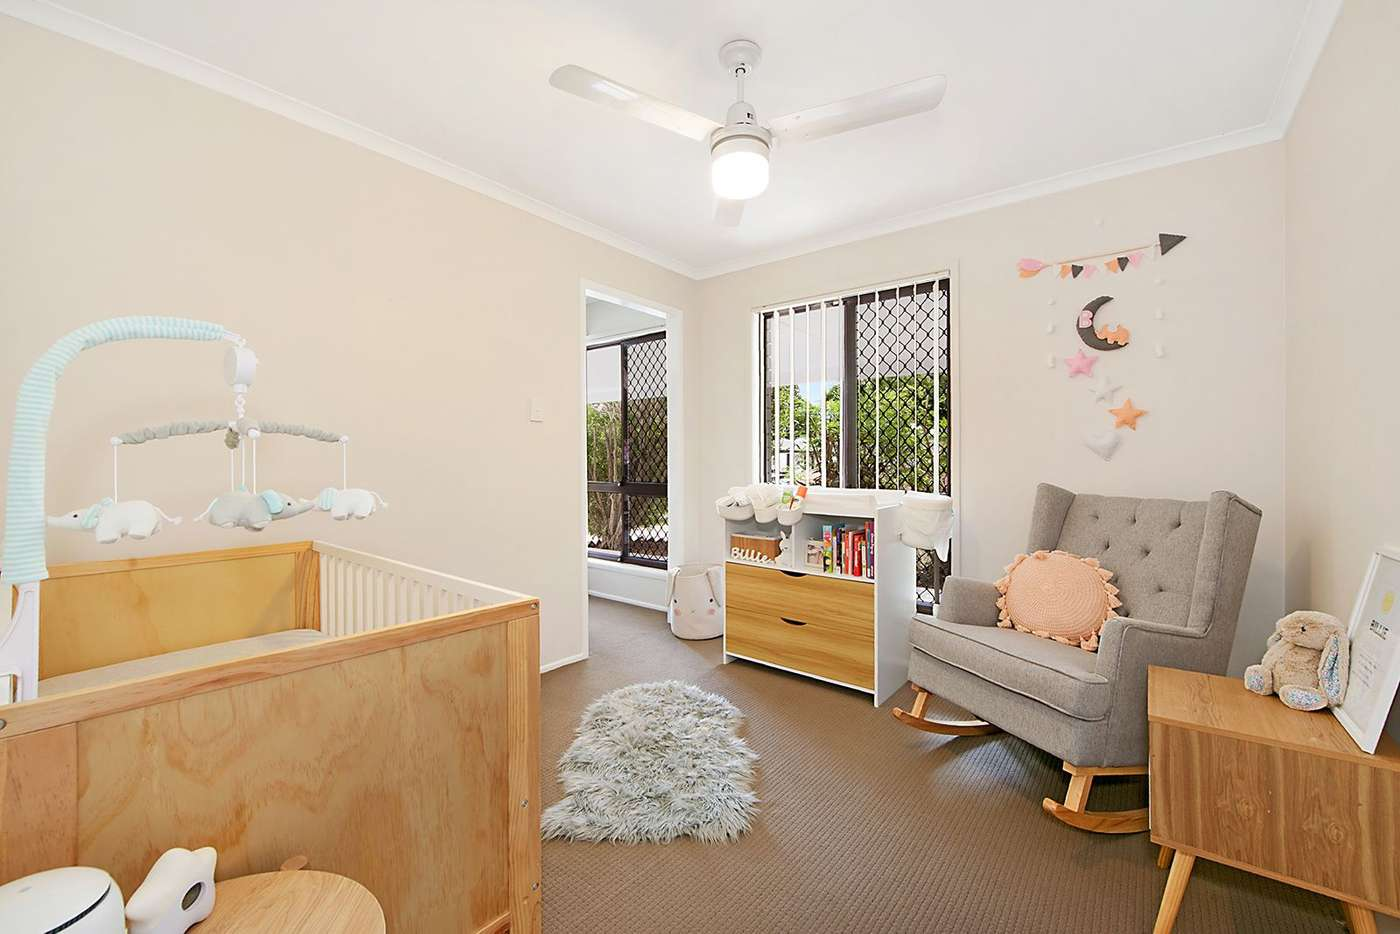 Fifth view of Homely house listing, 24 Samarai Street, Moggill QLD 4070